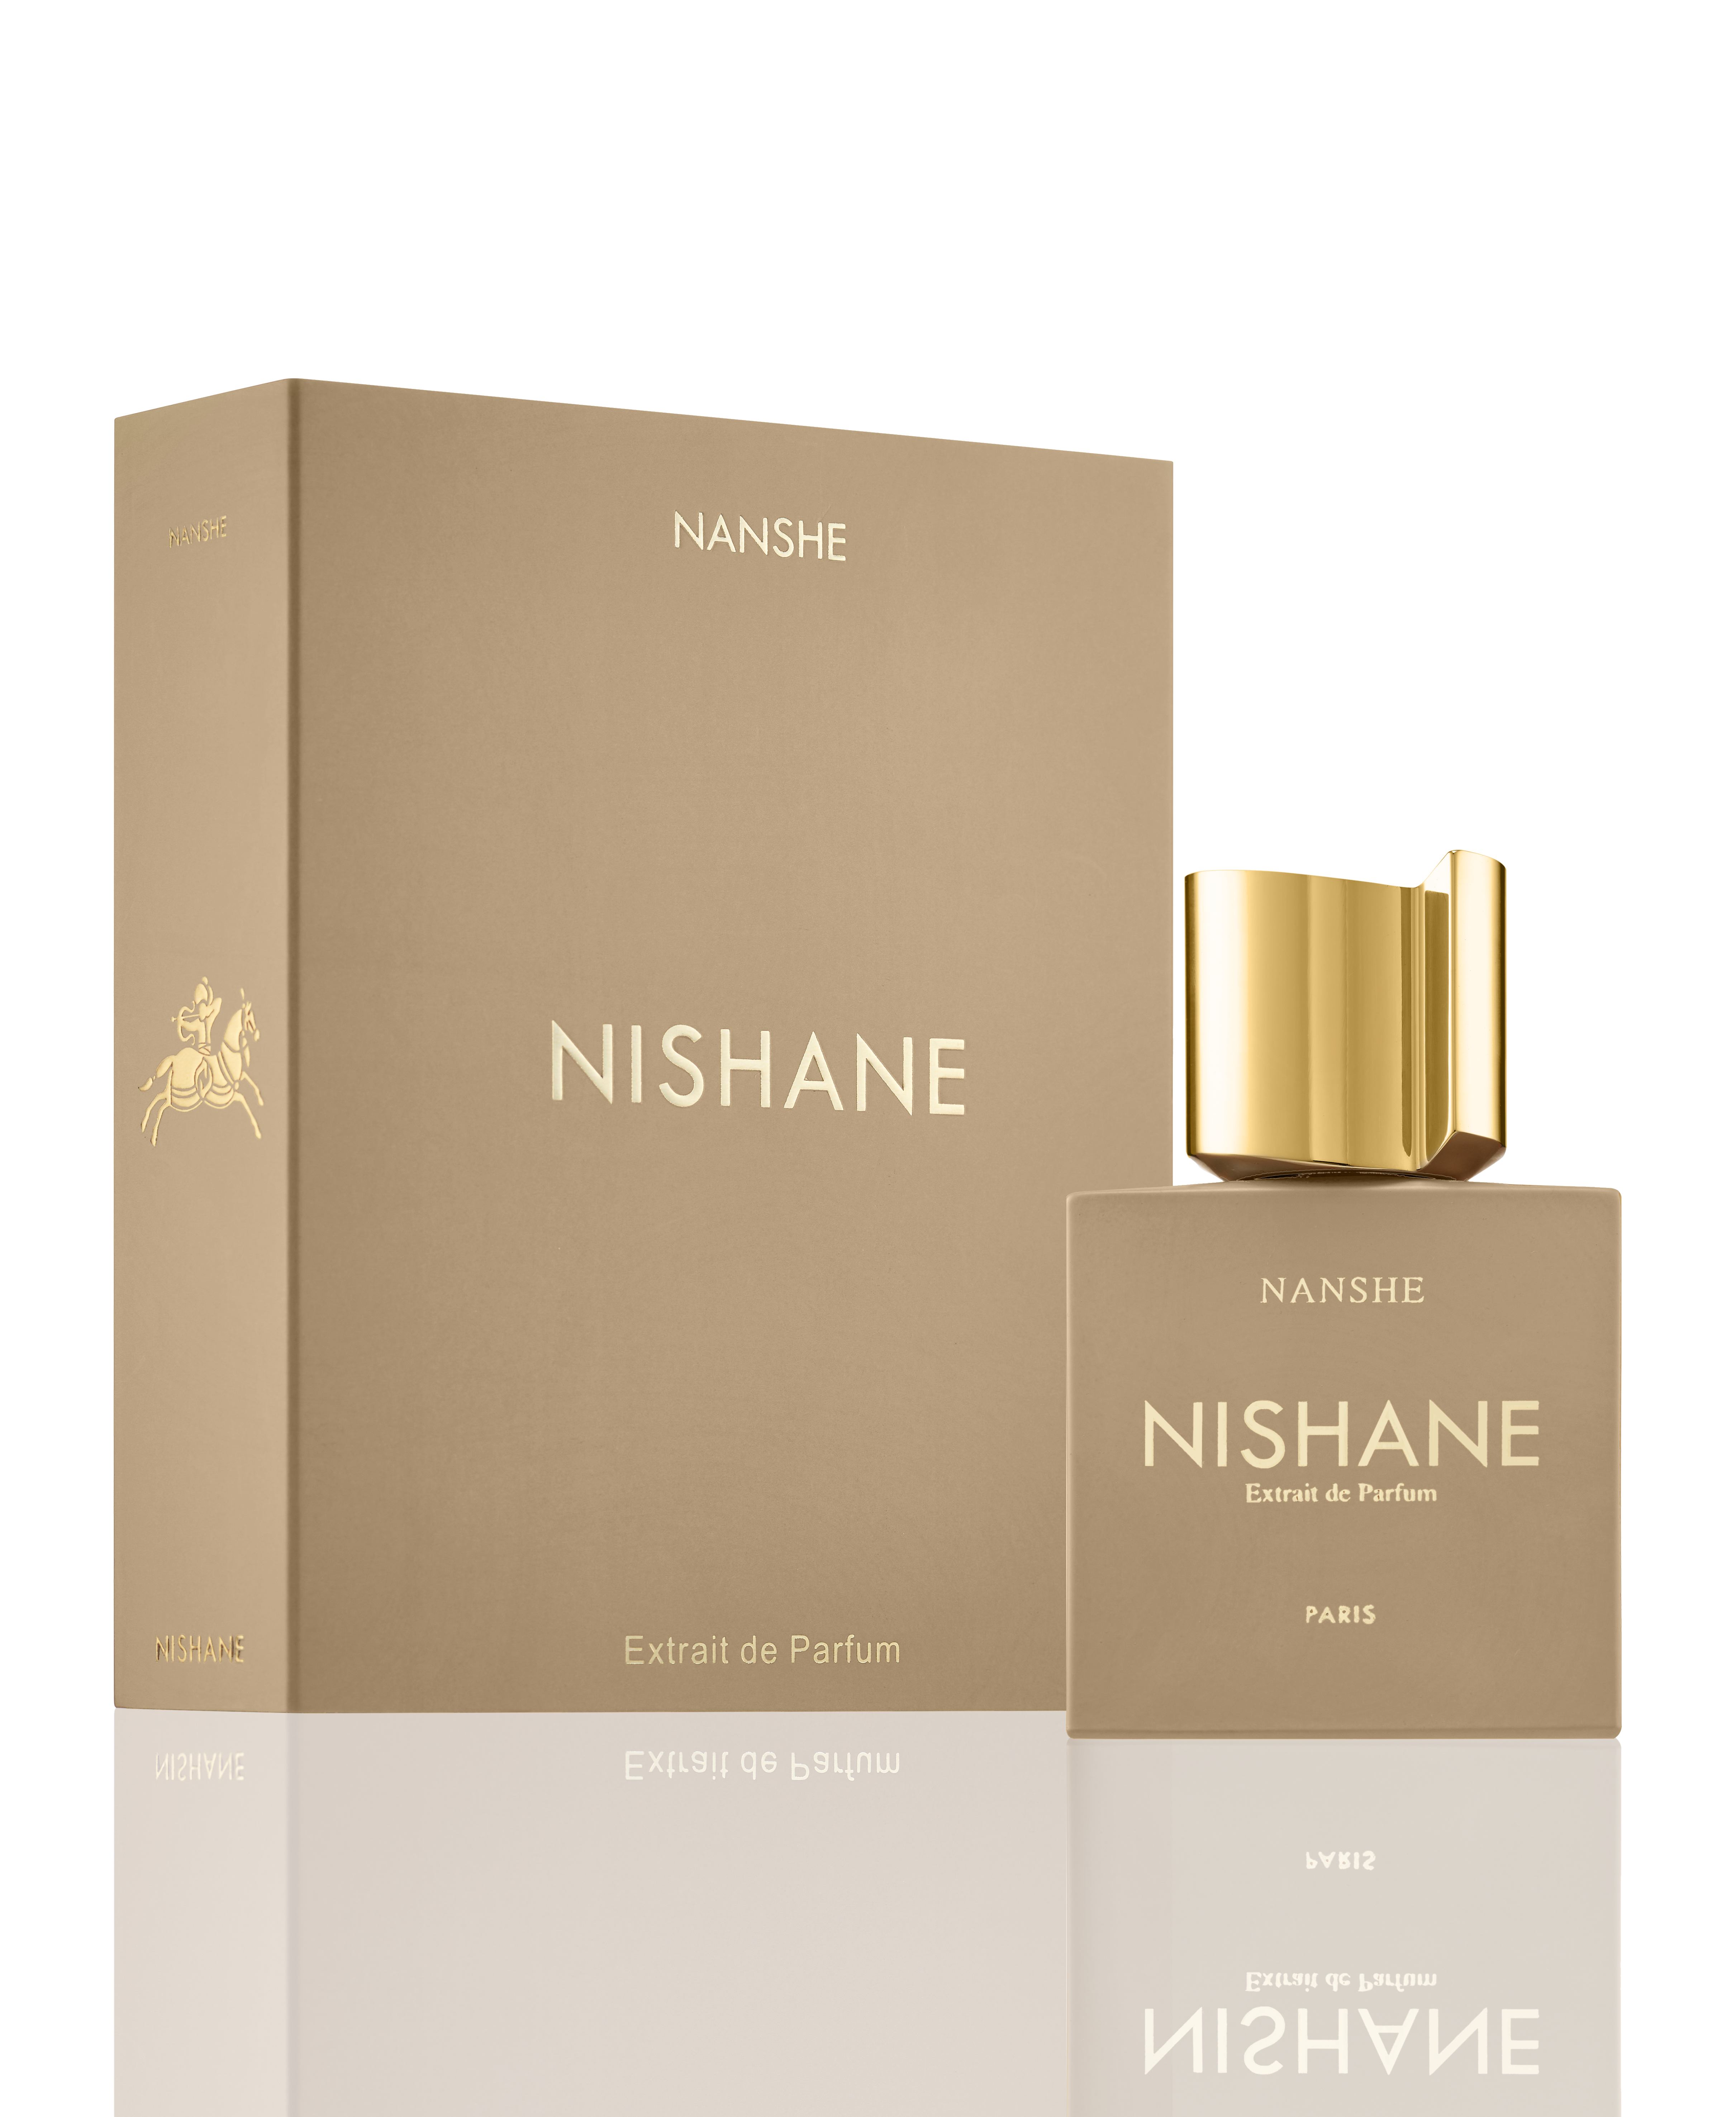 Nishane - Nanshe - Extrait de Parfum 50 ml